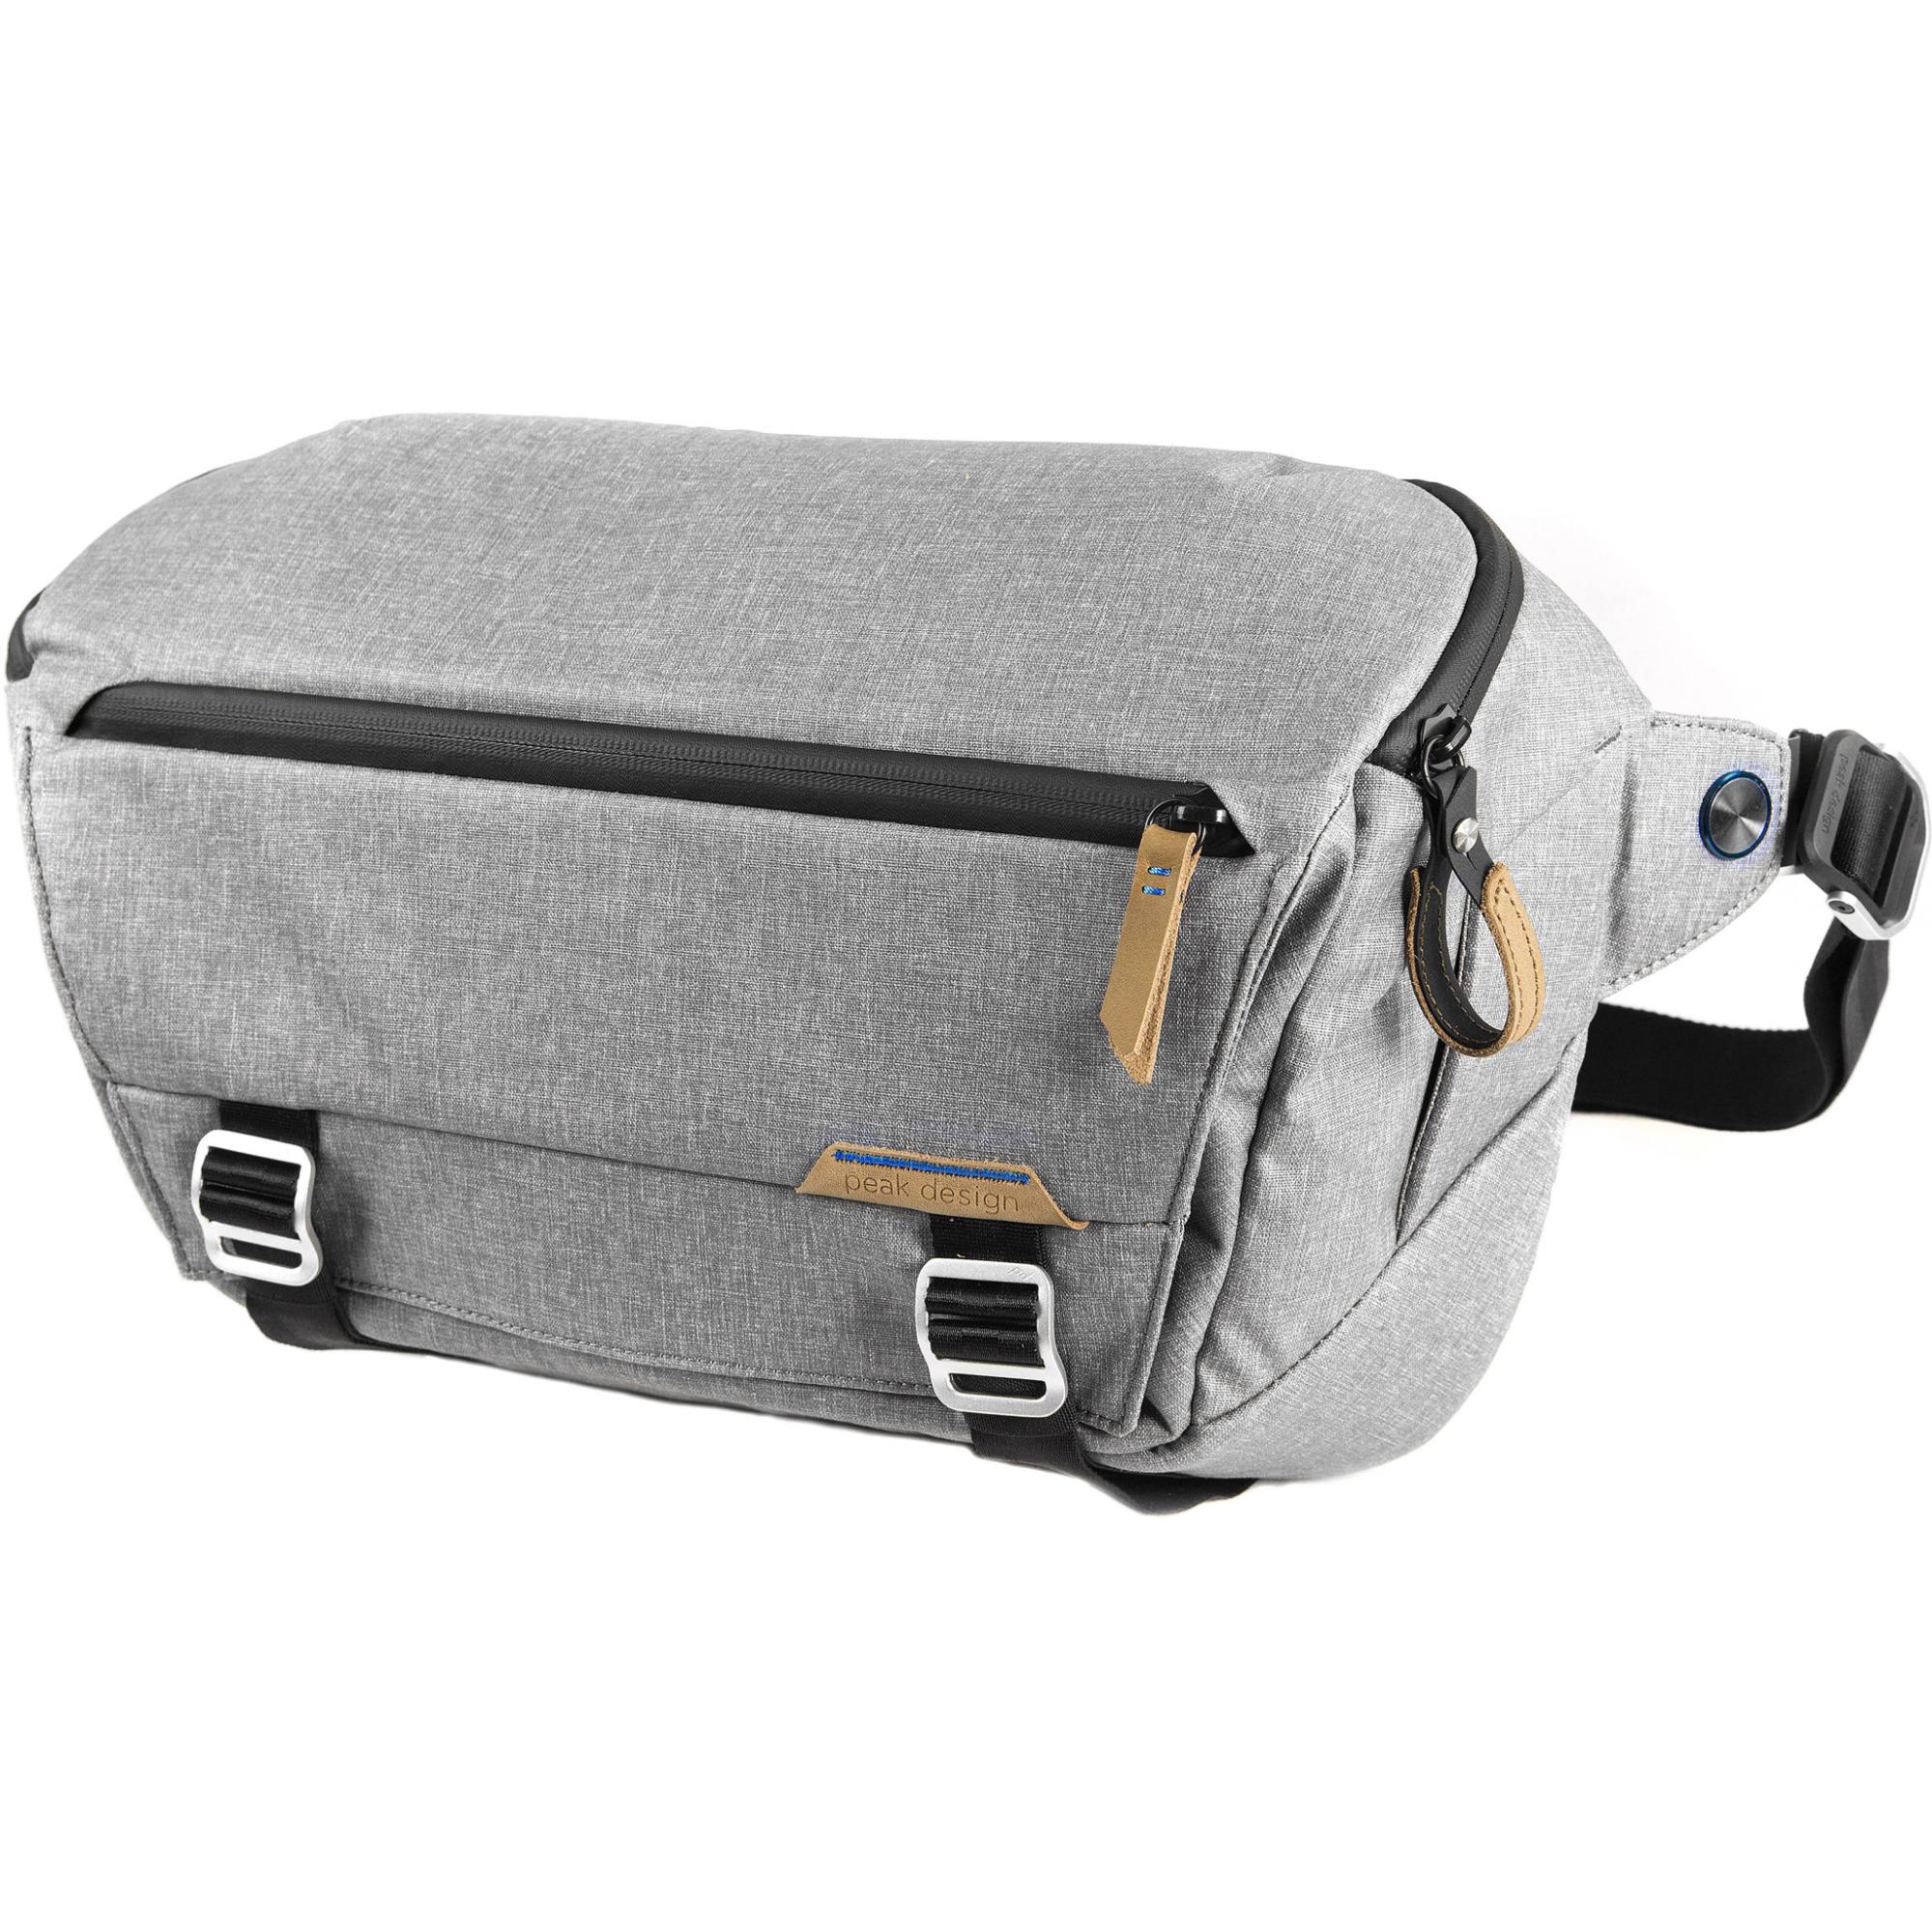 Best Camera Sling Bags - Peak Design Everyday Sling 10L